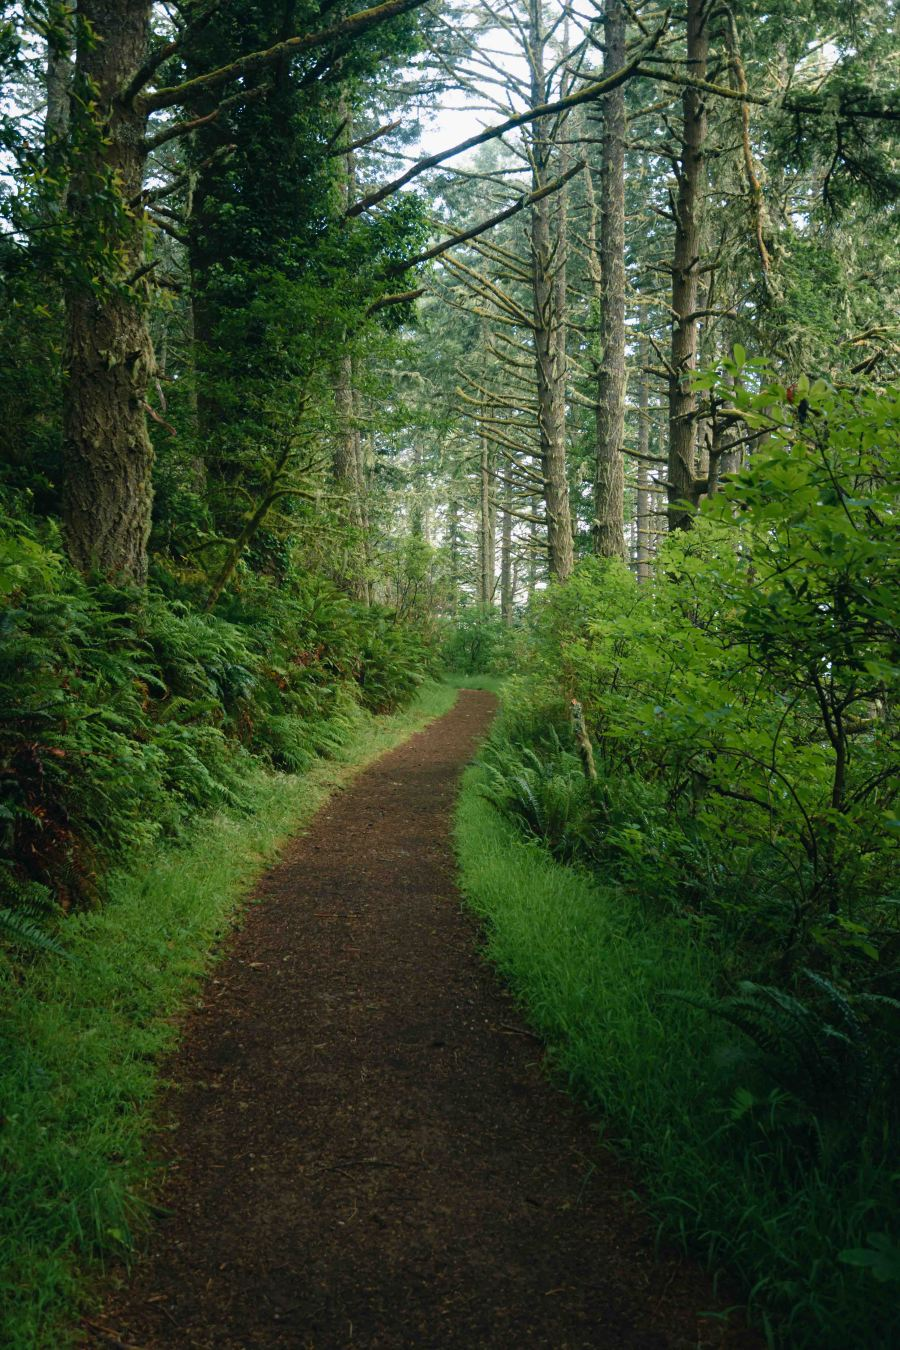 neilson landscape photography california bay area point reyes light on trail trees portrait